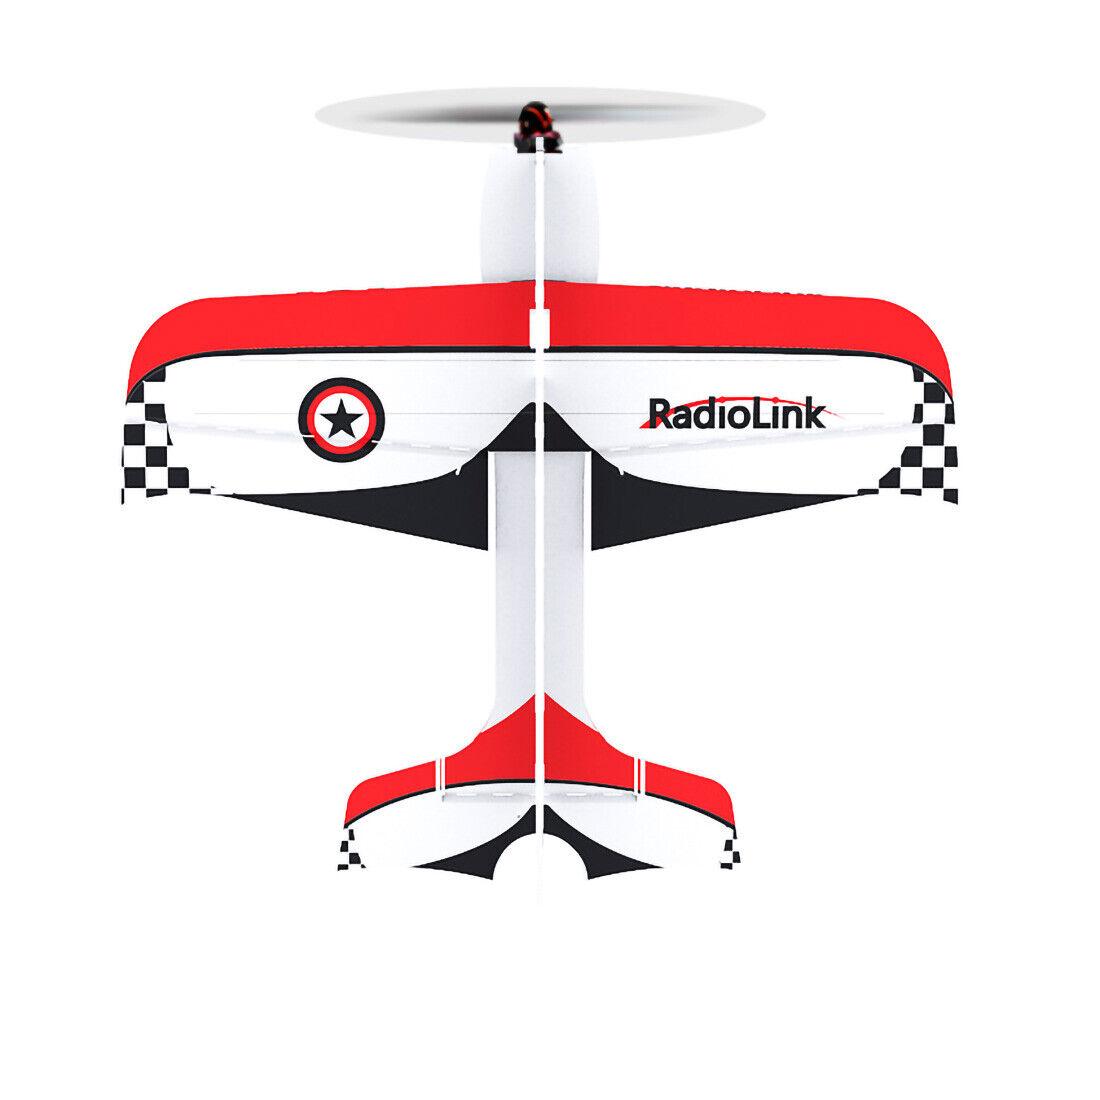 Radiolink A560 560mm Wingspan 3D Poly Fixed Wing  RC Aircraft Drone Airplane RTF  risparmia fino al 50%